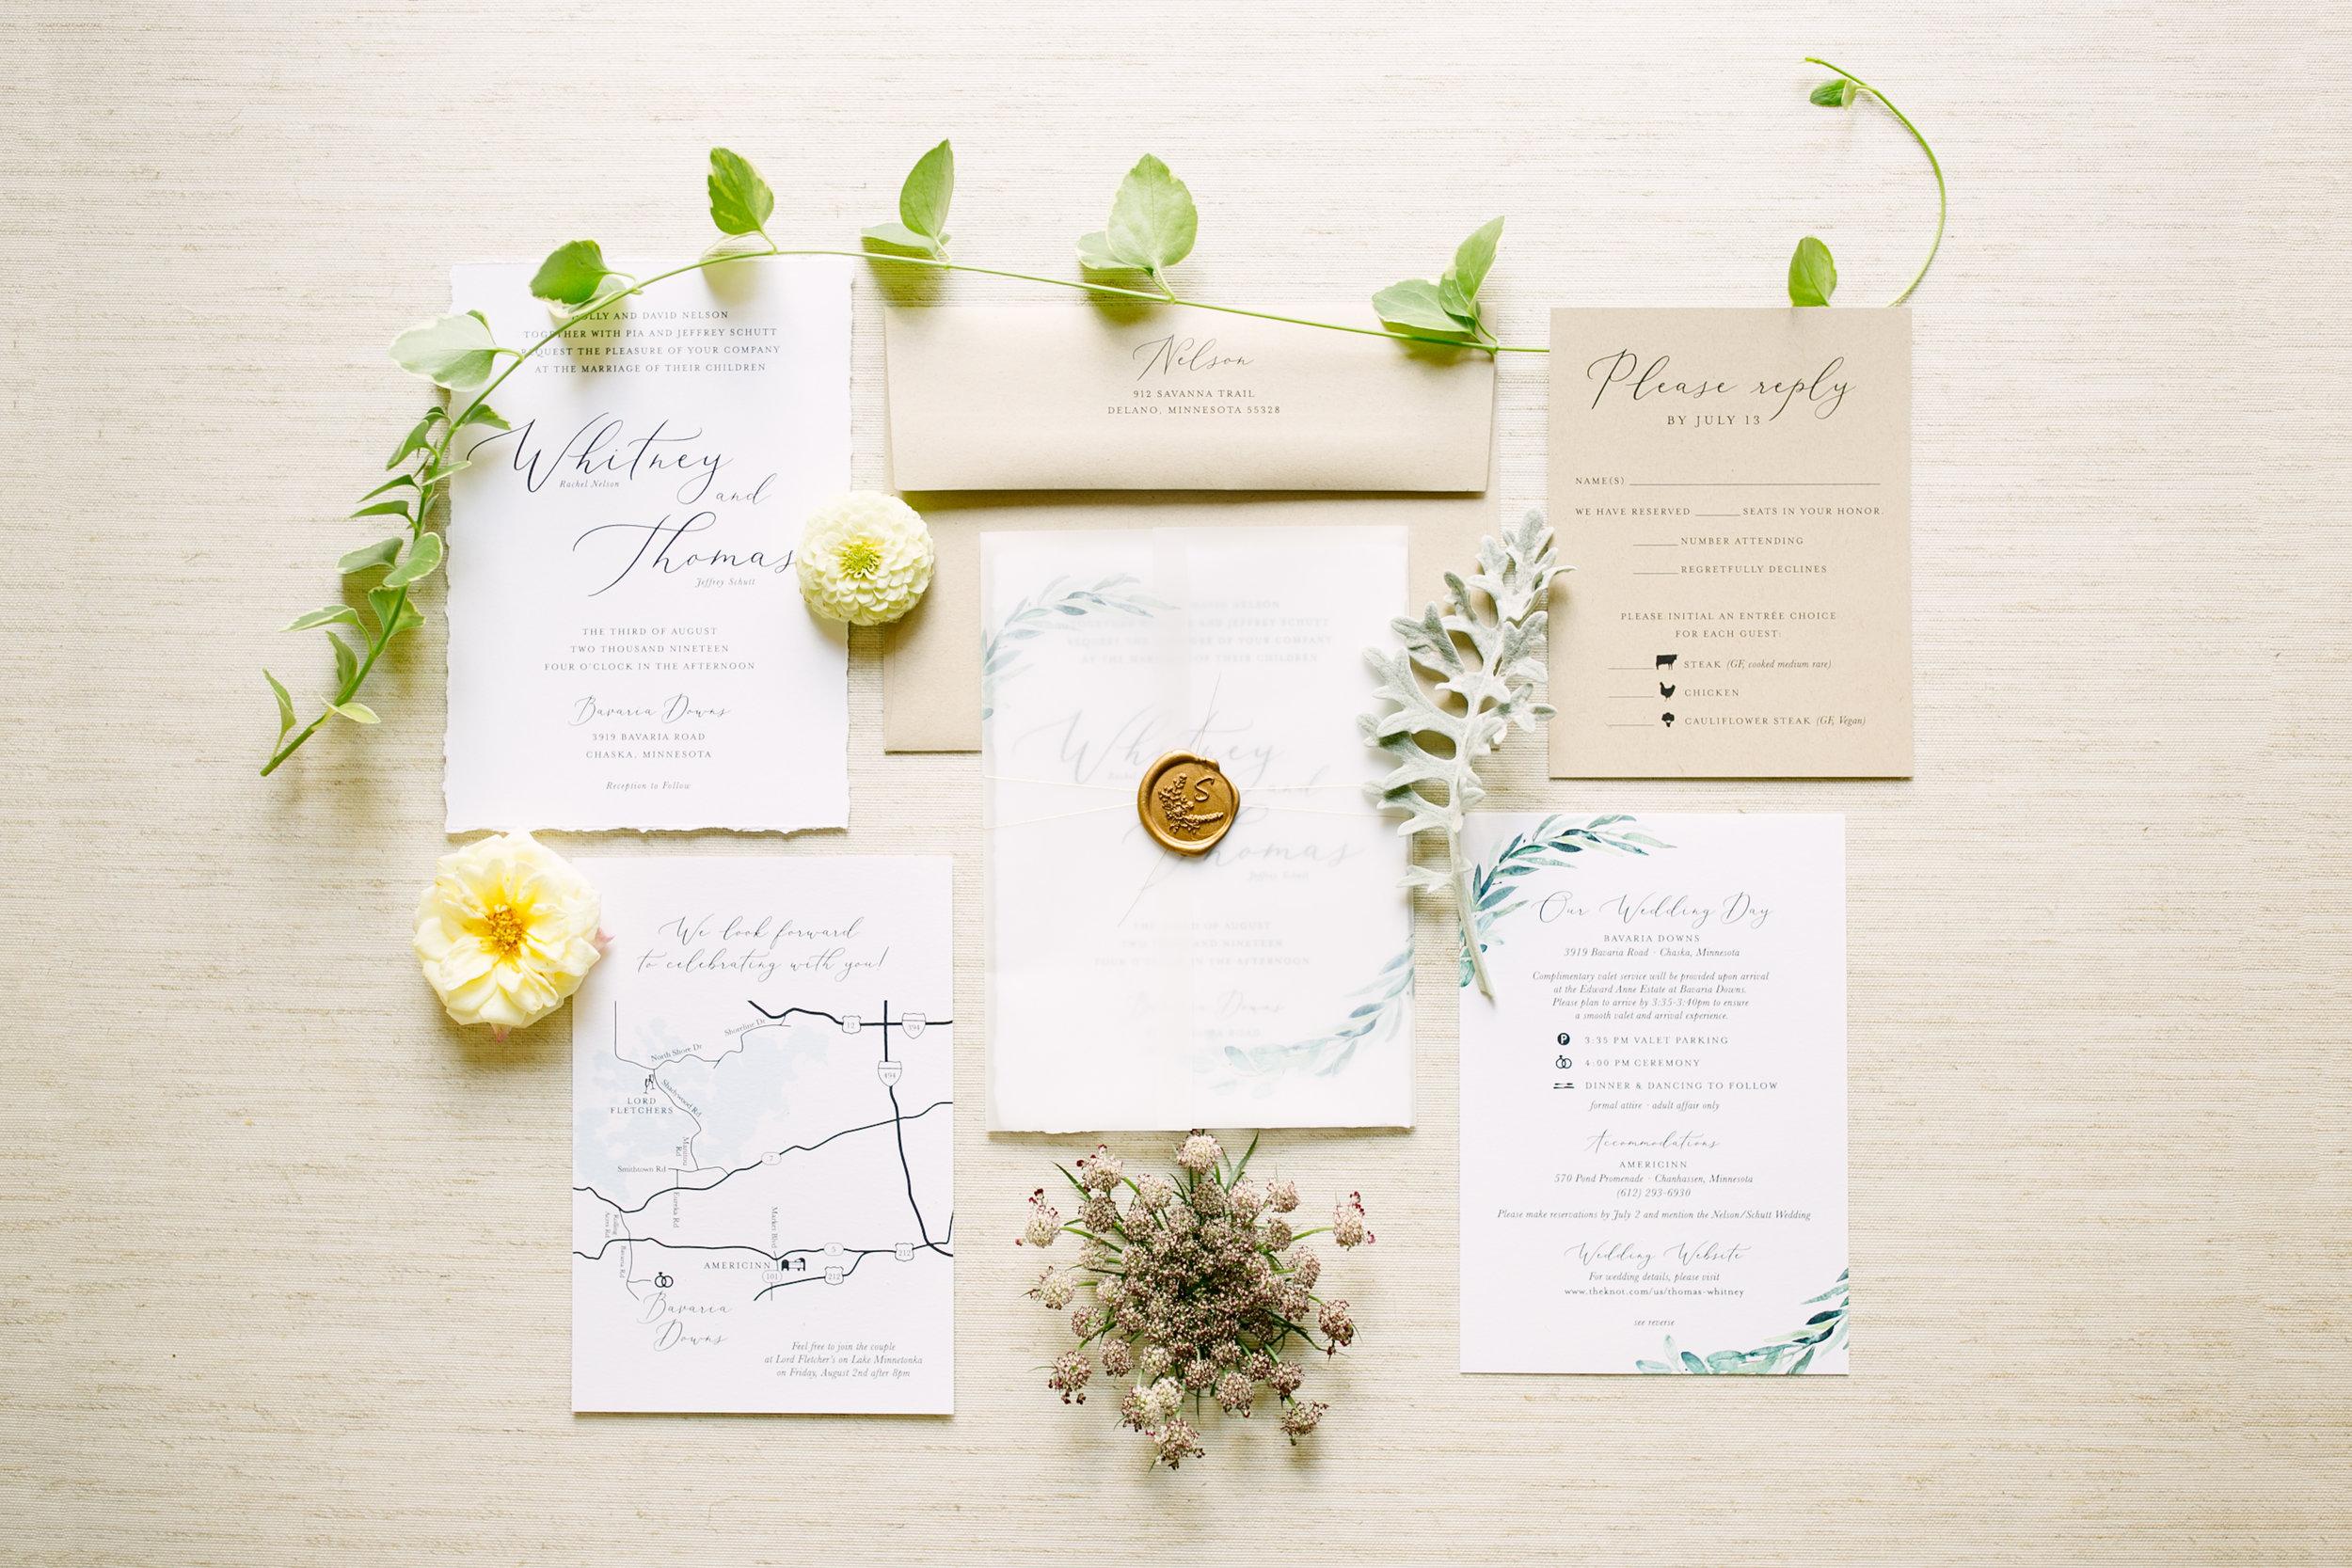 Vellum and Greenery Wedding Invitation